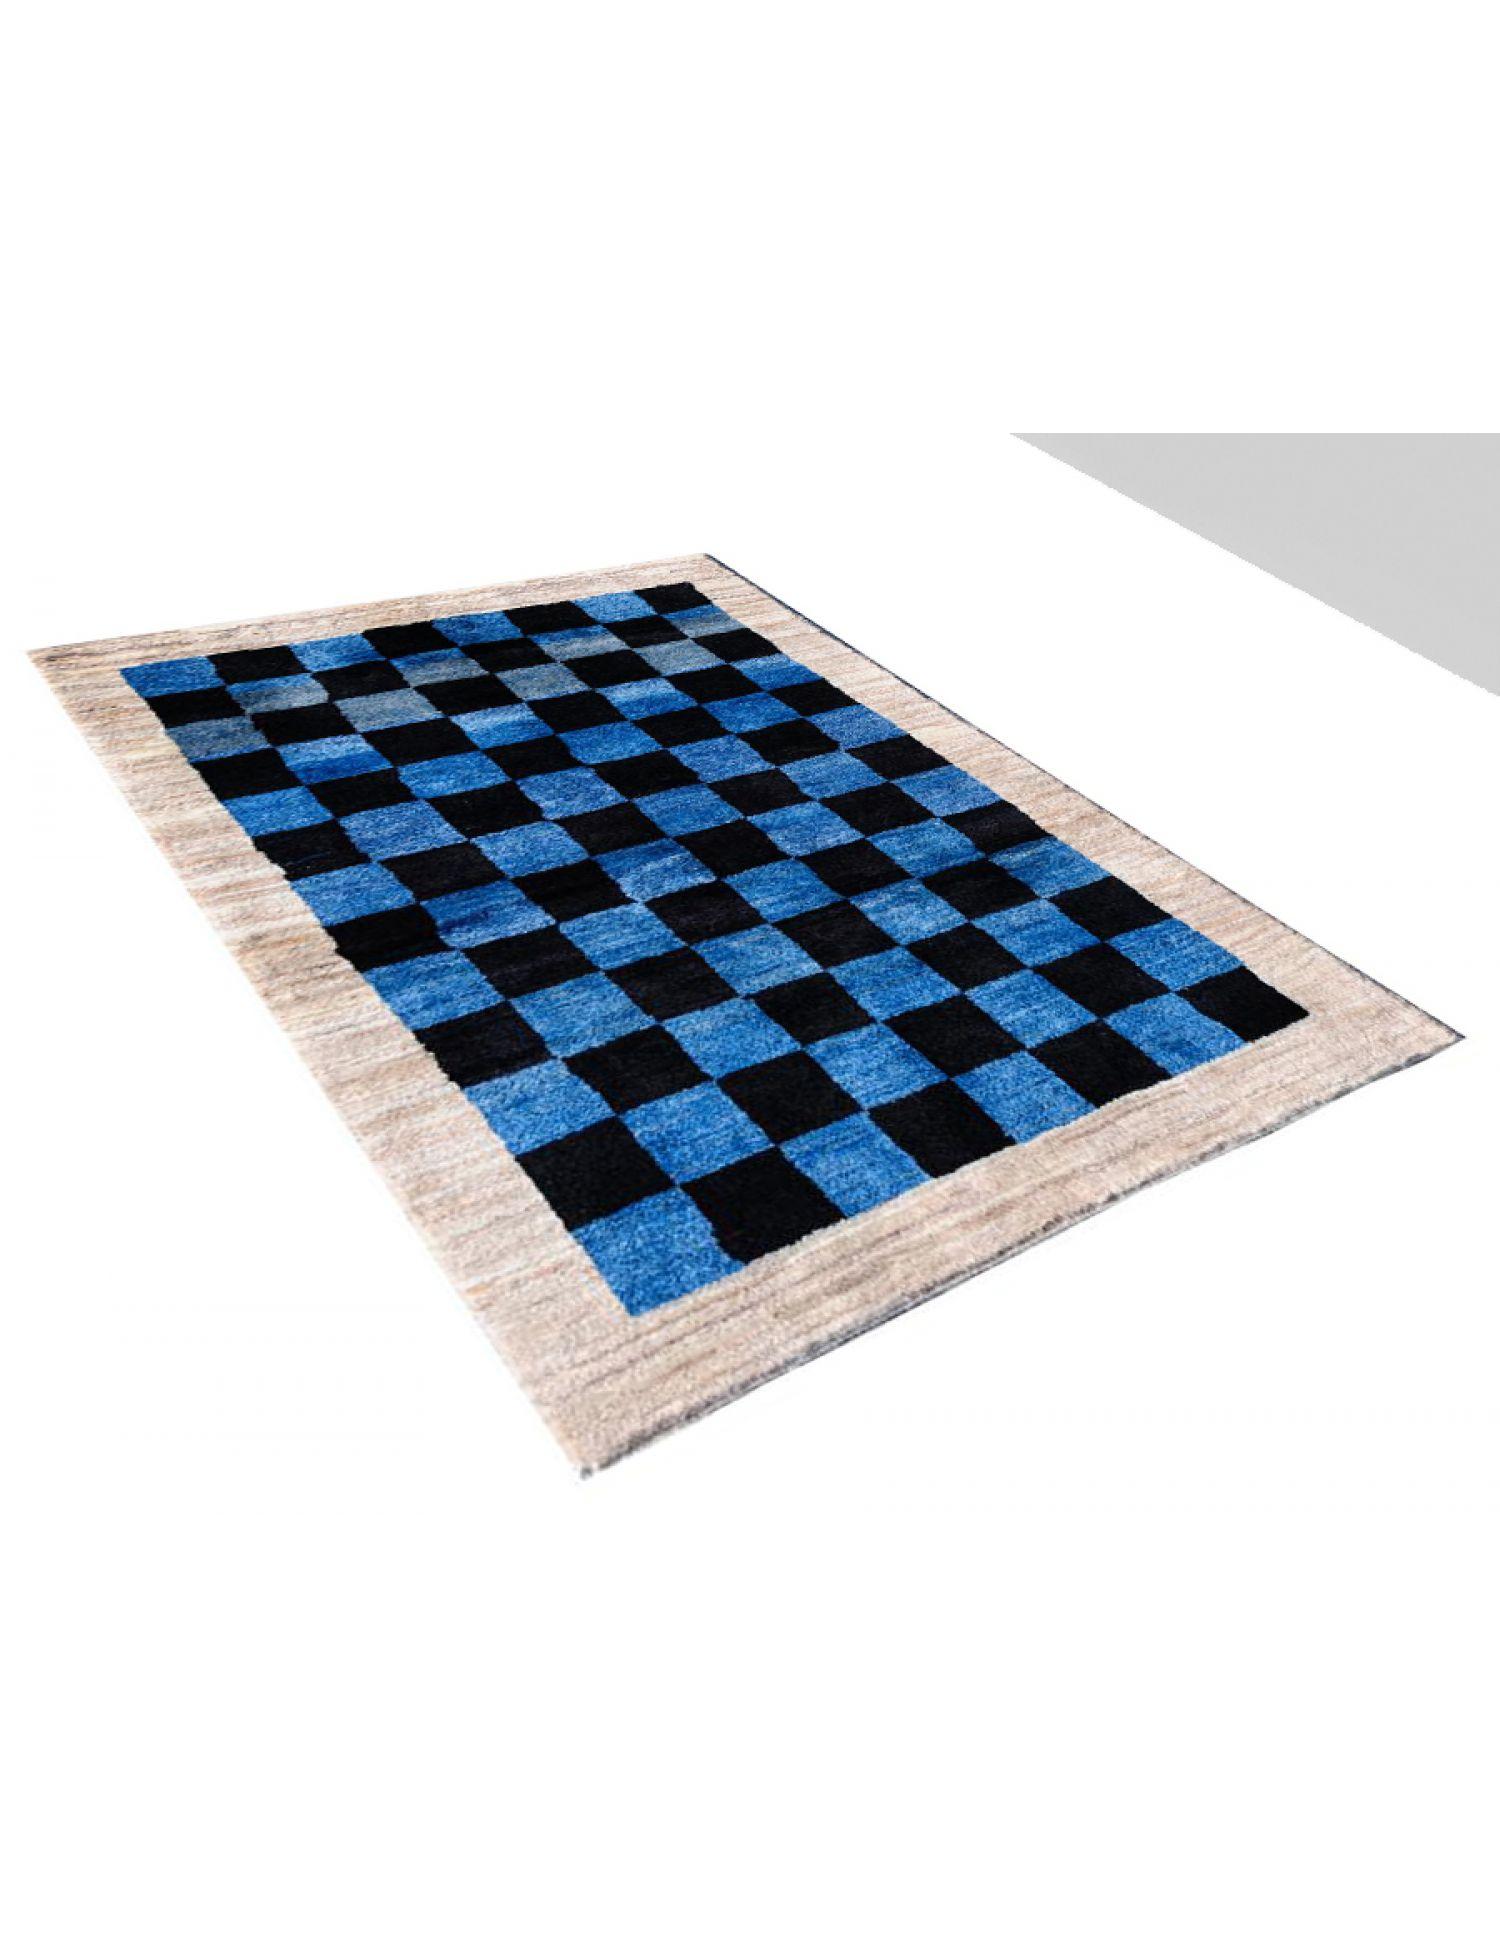 Moderne Teppiche  blau <br/>145 x 108 cm